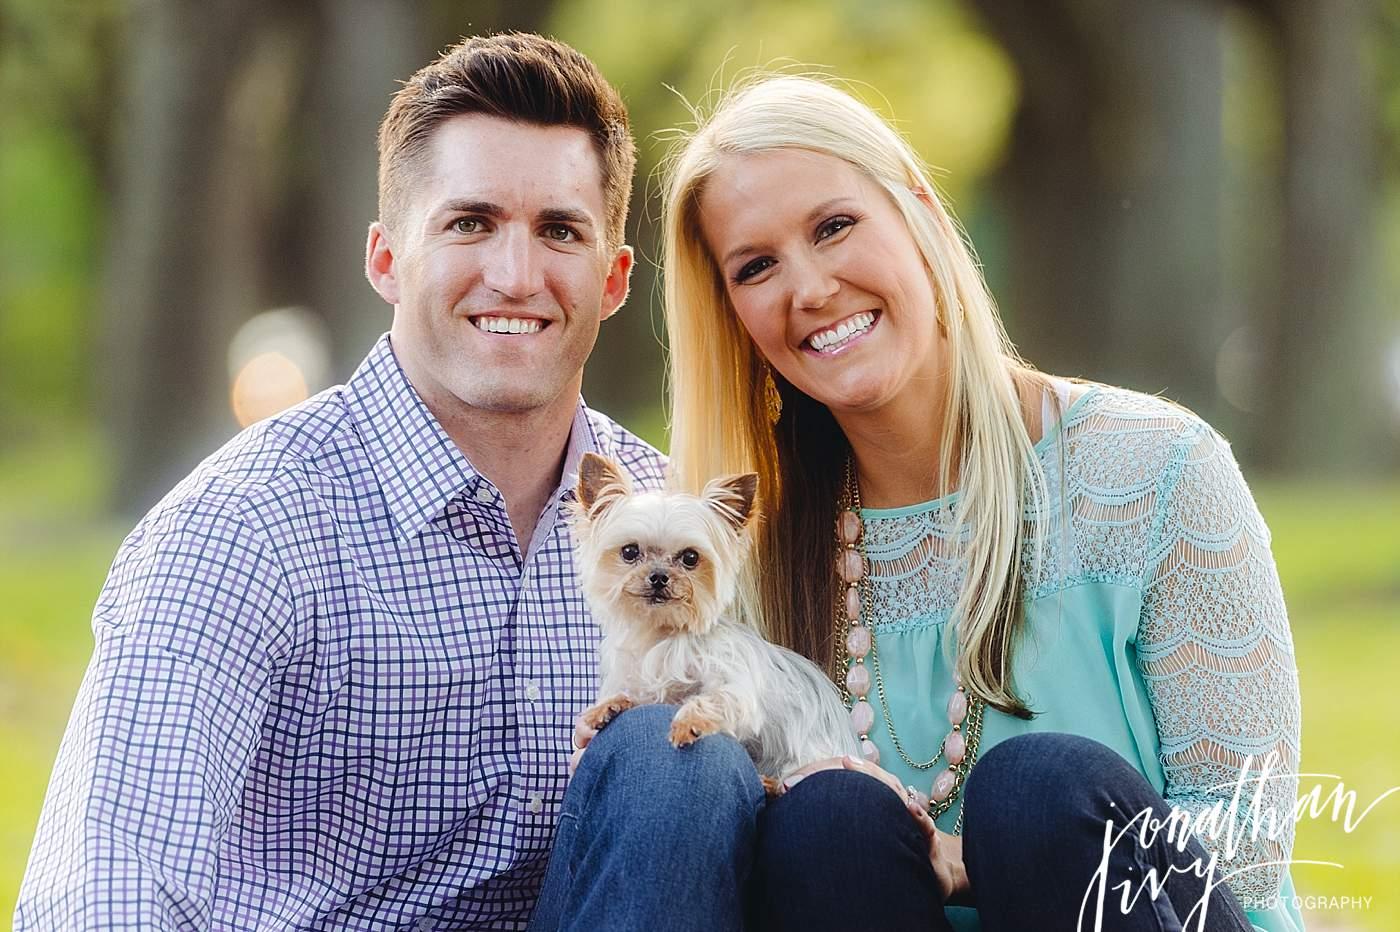 Puppy Engagement Photos